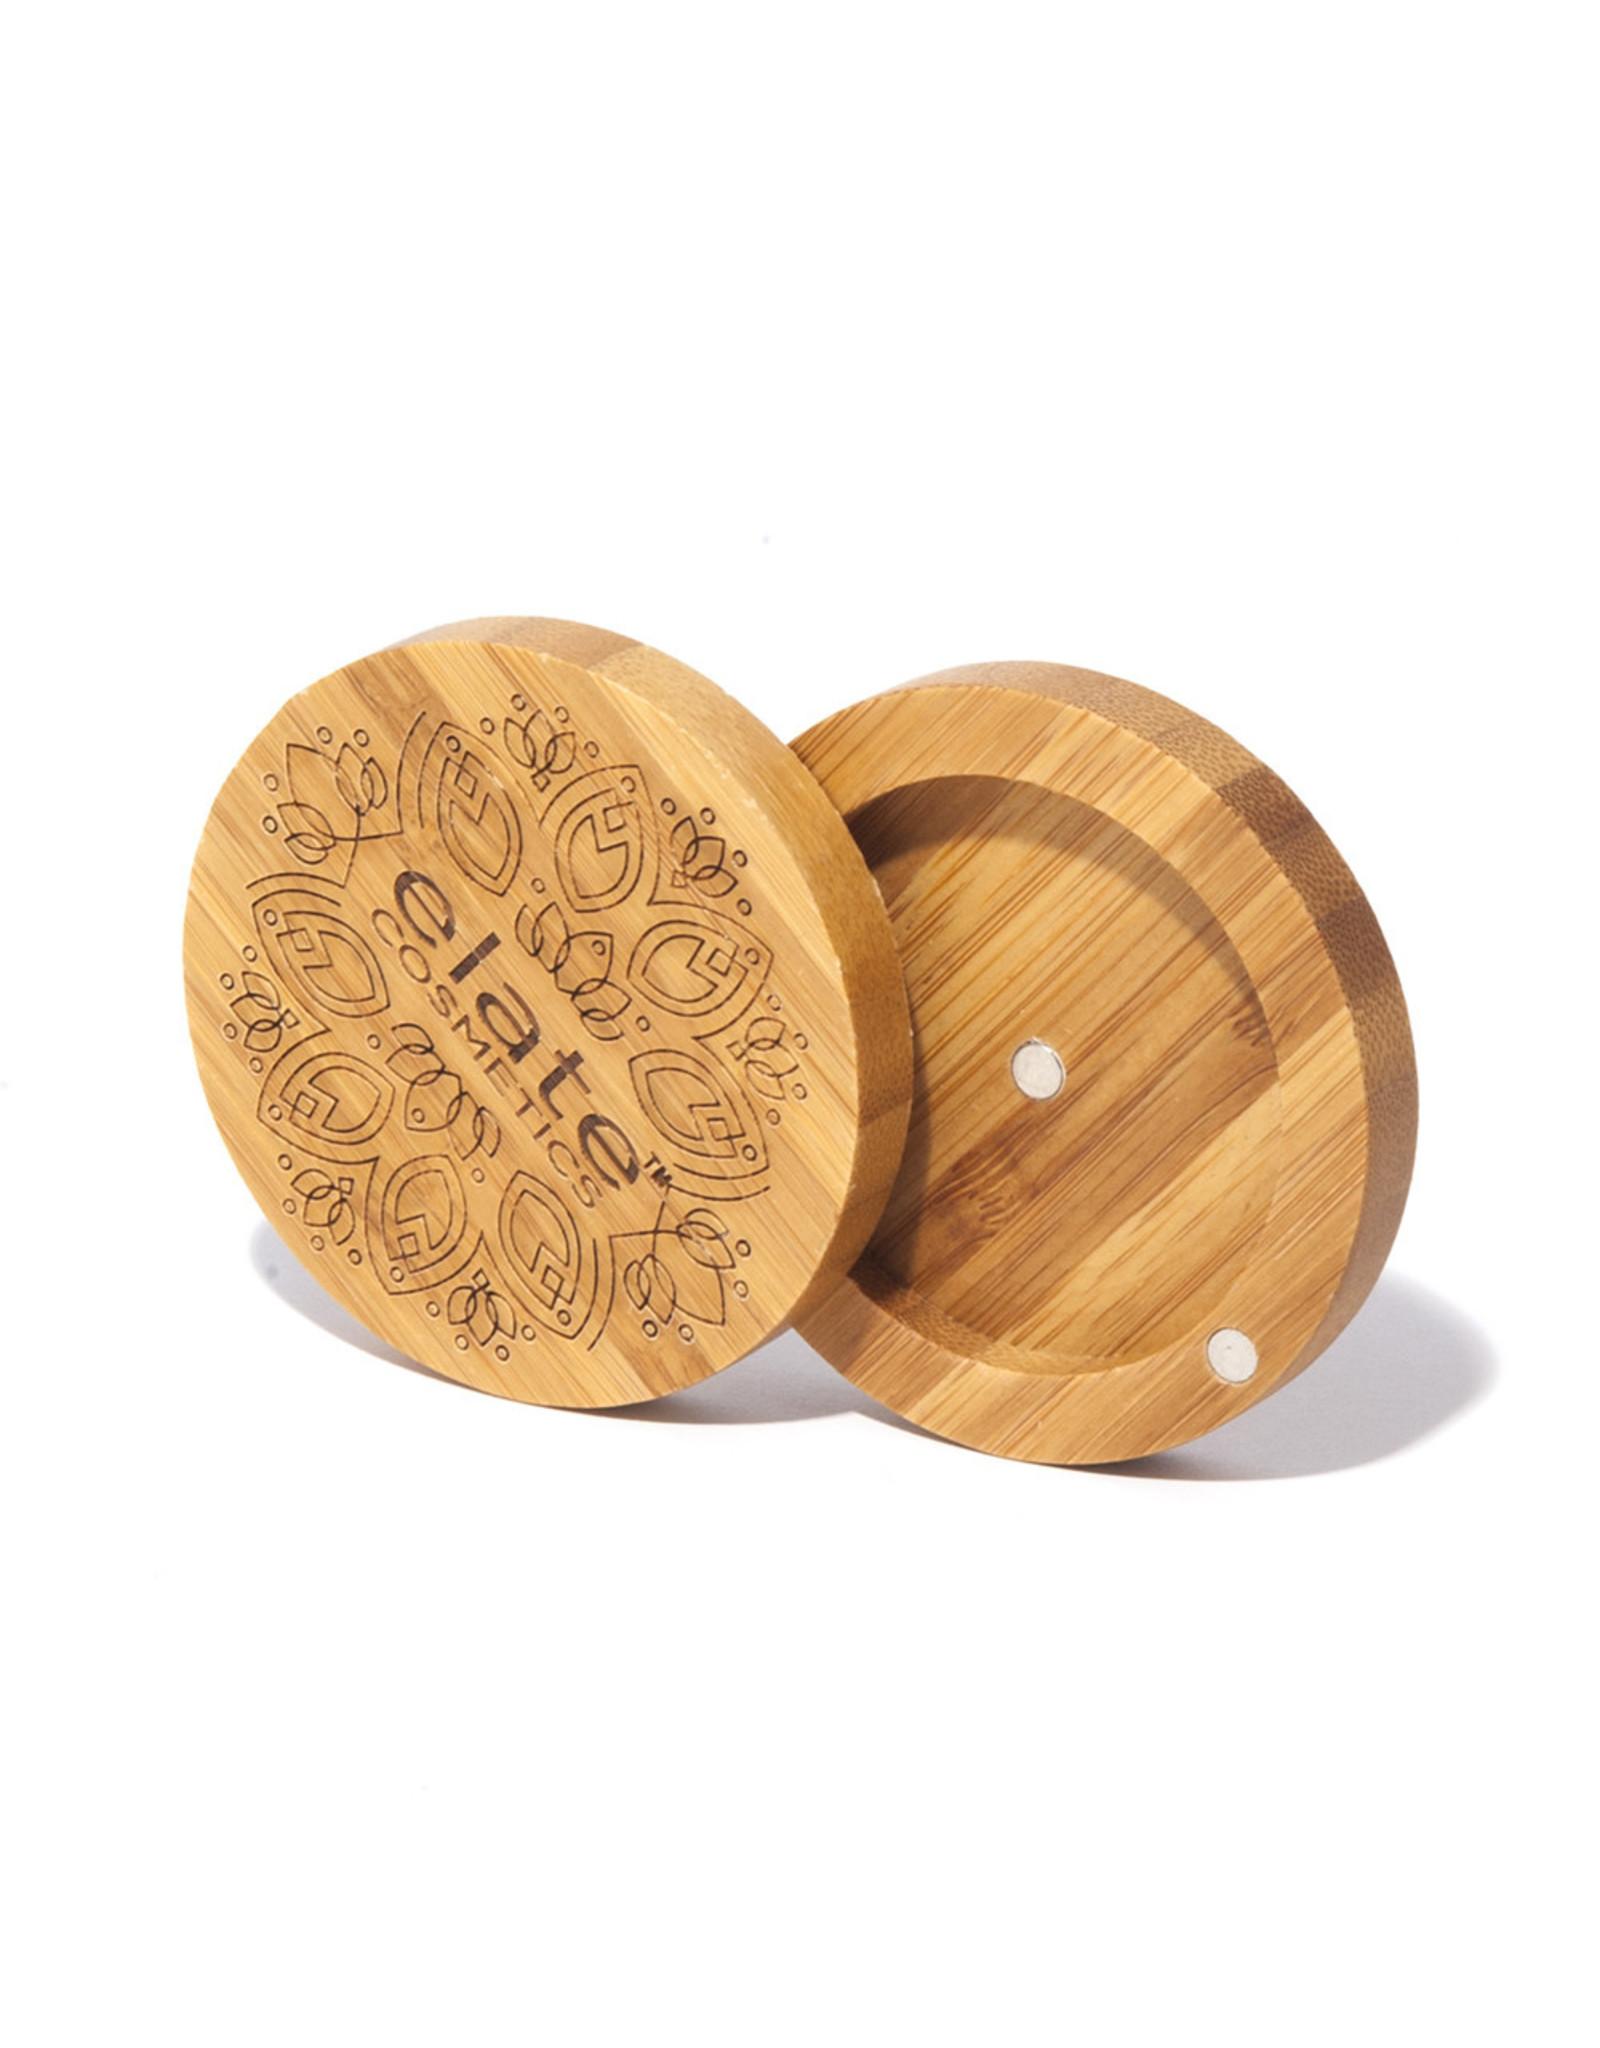 Elate Cosmetics Elate Bamboo Blush Compact